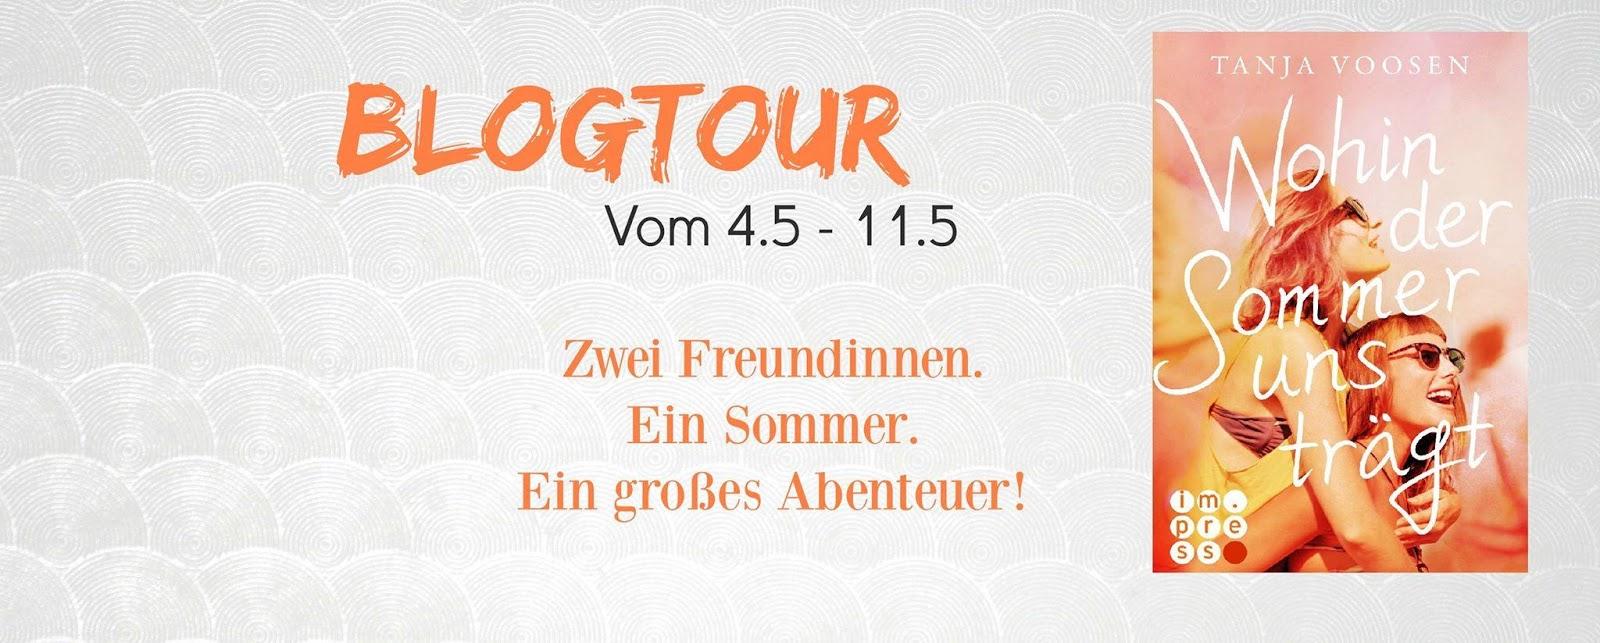 Blogtour Bucherparadies